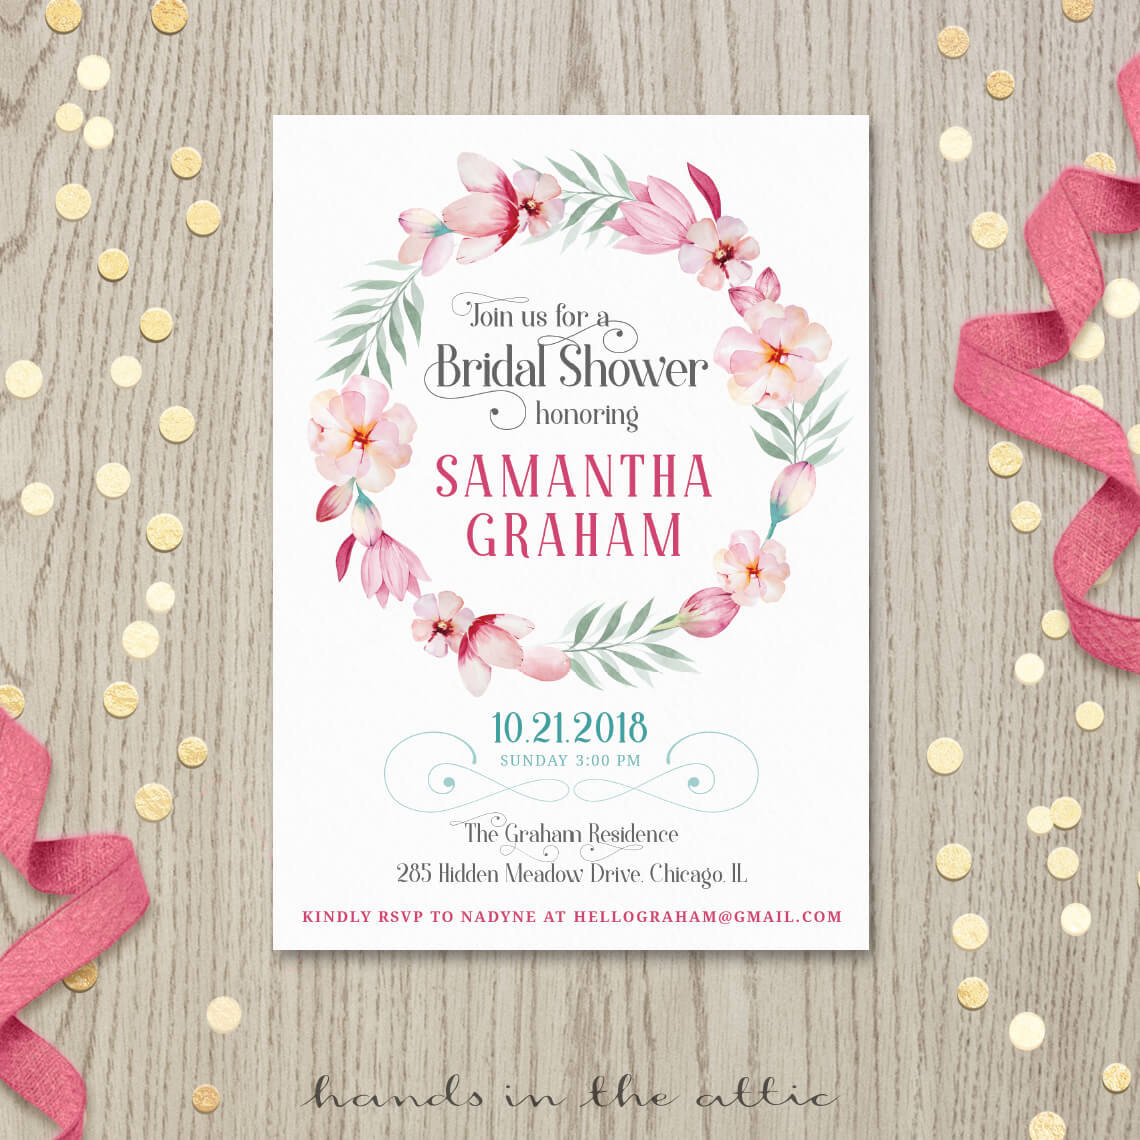 Pink floral bridal shower invitation printable stationery image for pink floral bridal shower invitation filmwisefo